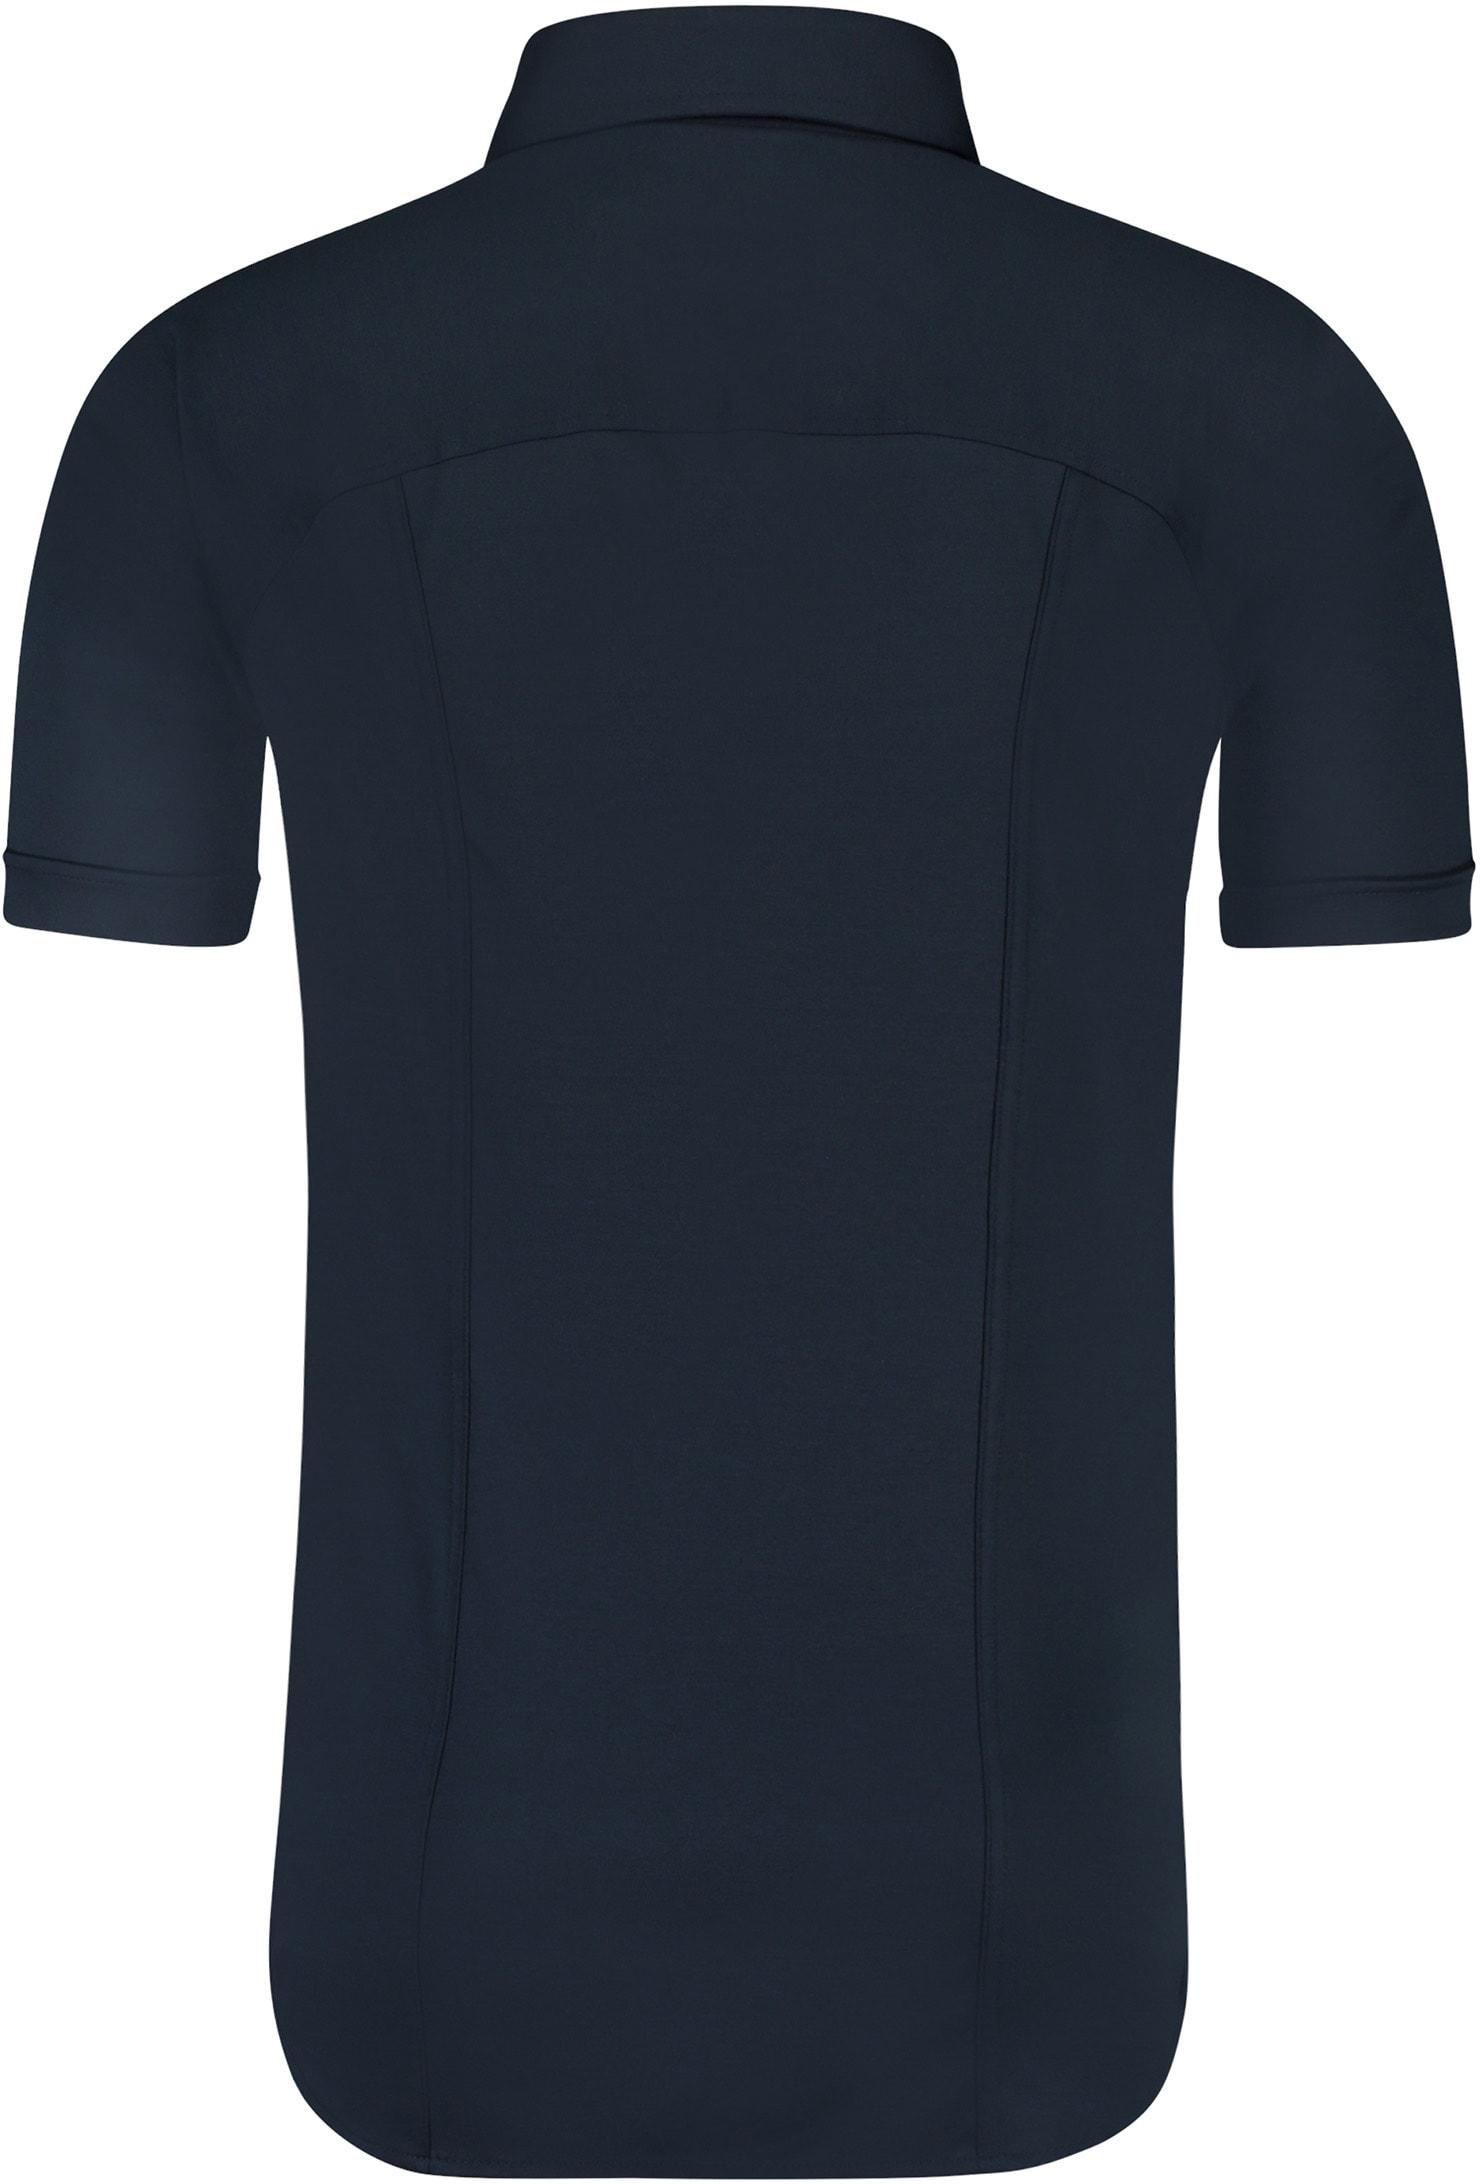 Desoto Overhemd Korte Mouw Navy foto 1